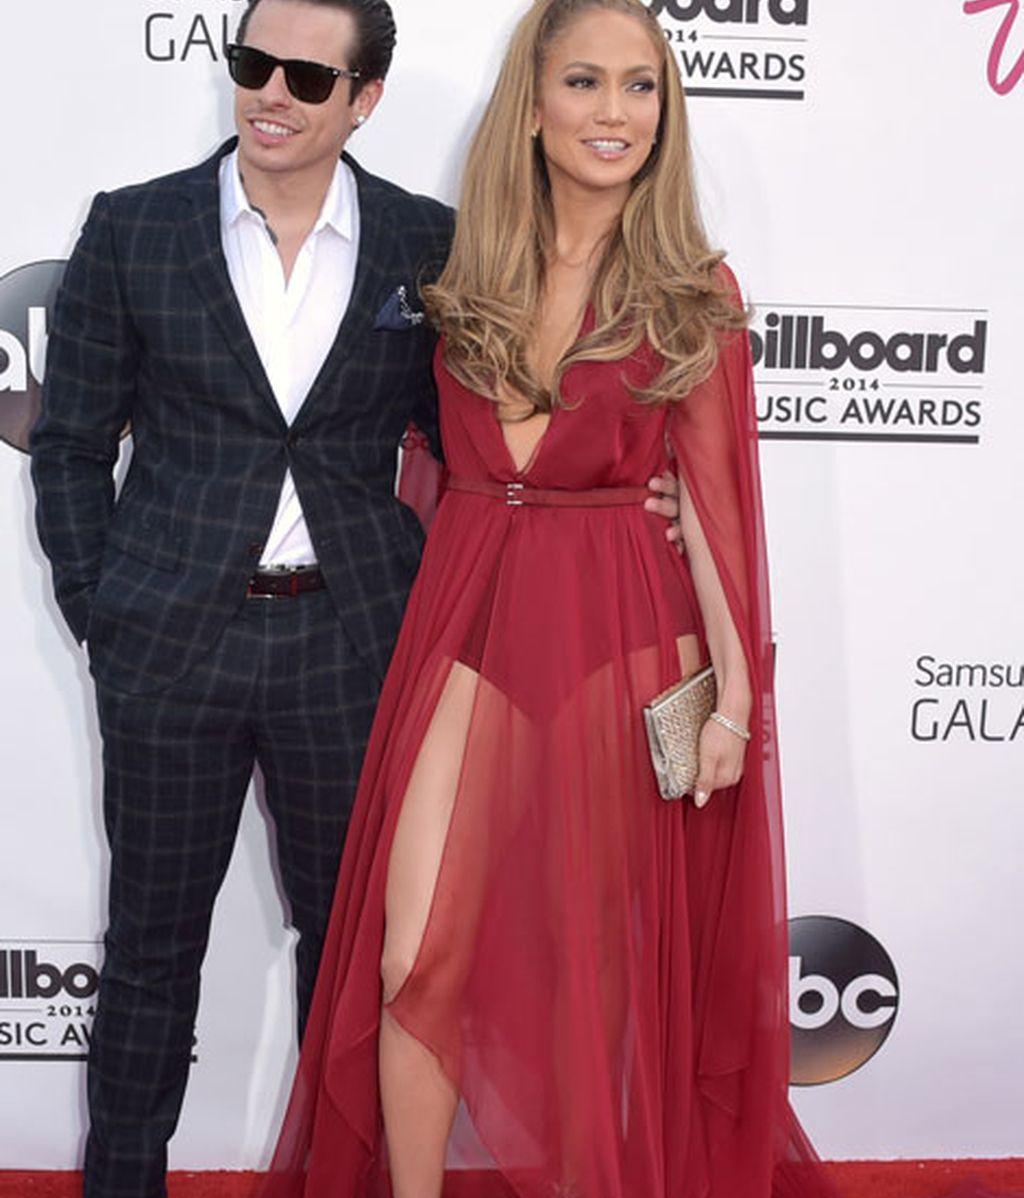 La pareja formada por Jennifer Lopez y Casper Smart